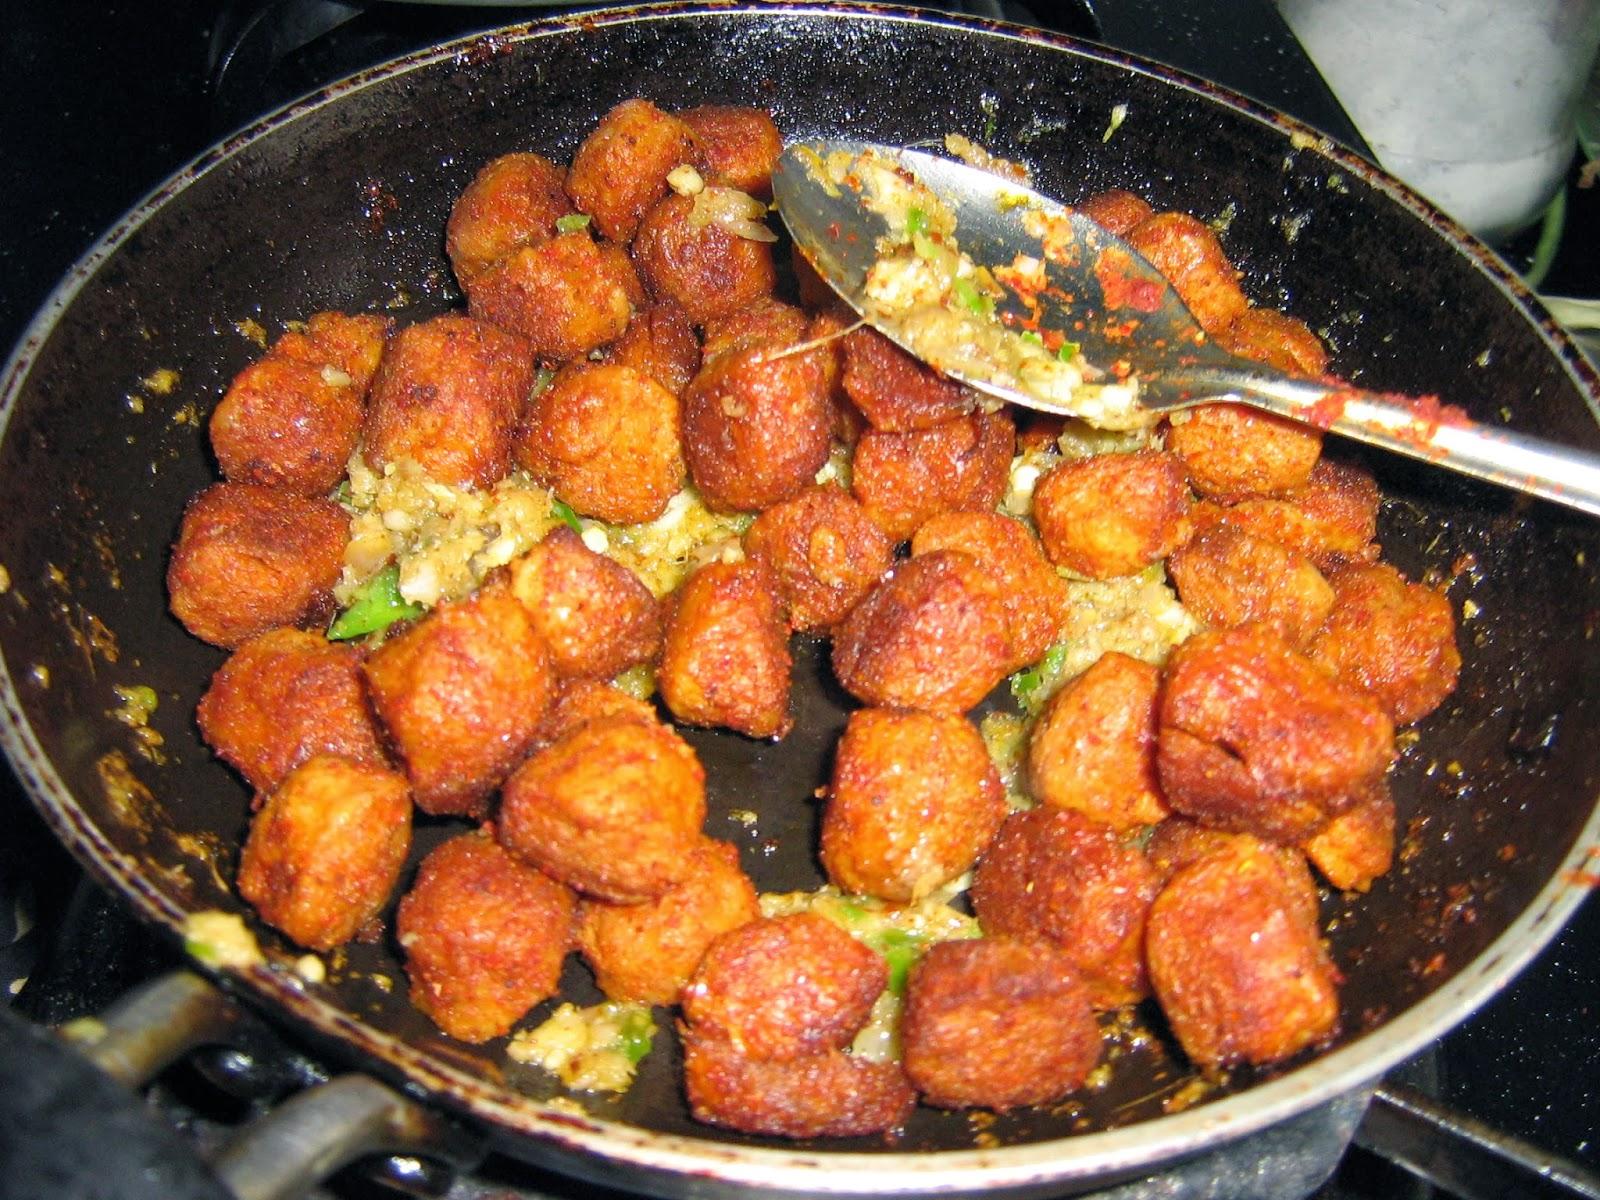 Soya fry soya chunks fry recipe meal maker fry how to make soya fry 8 forumfinder Choice Image